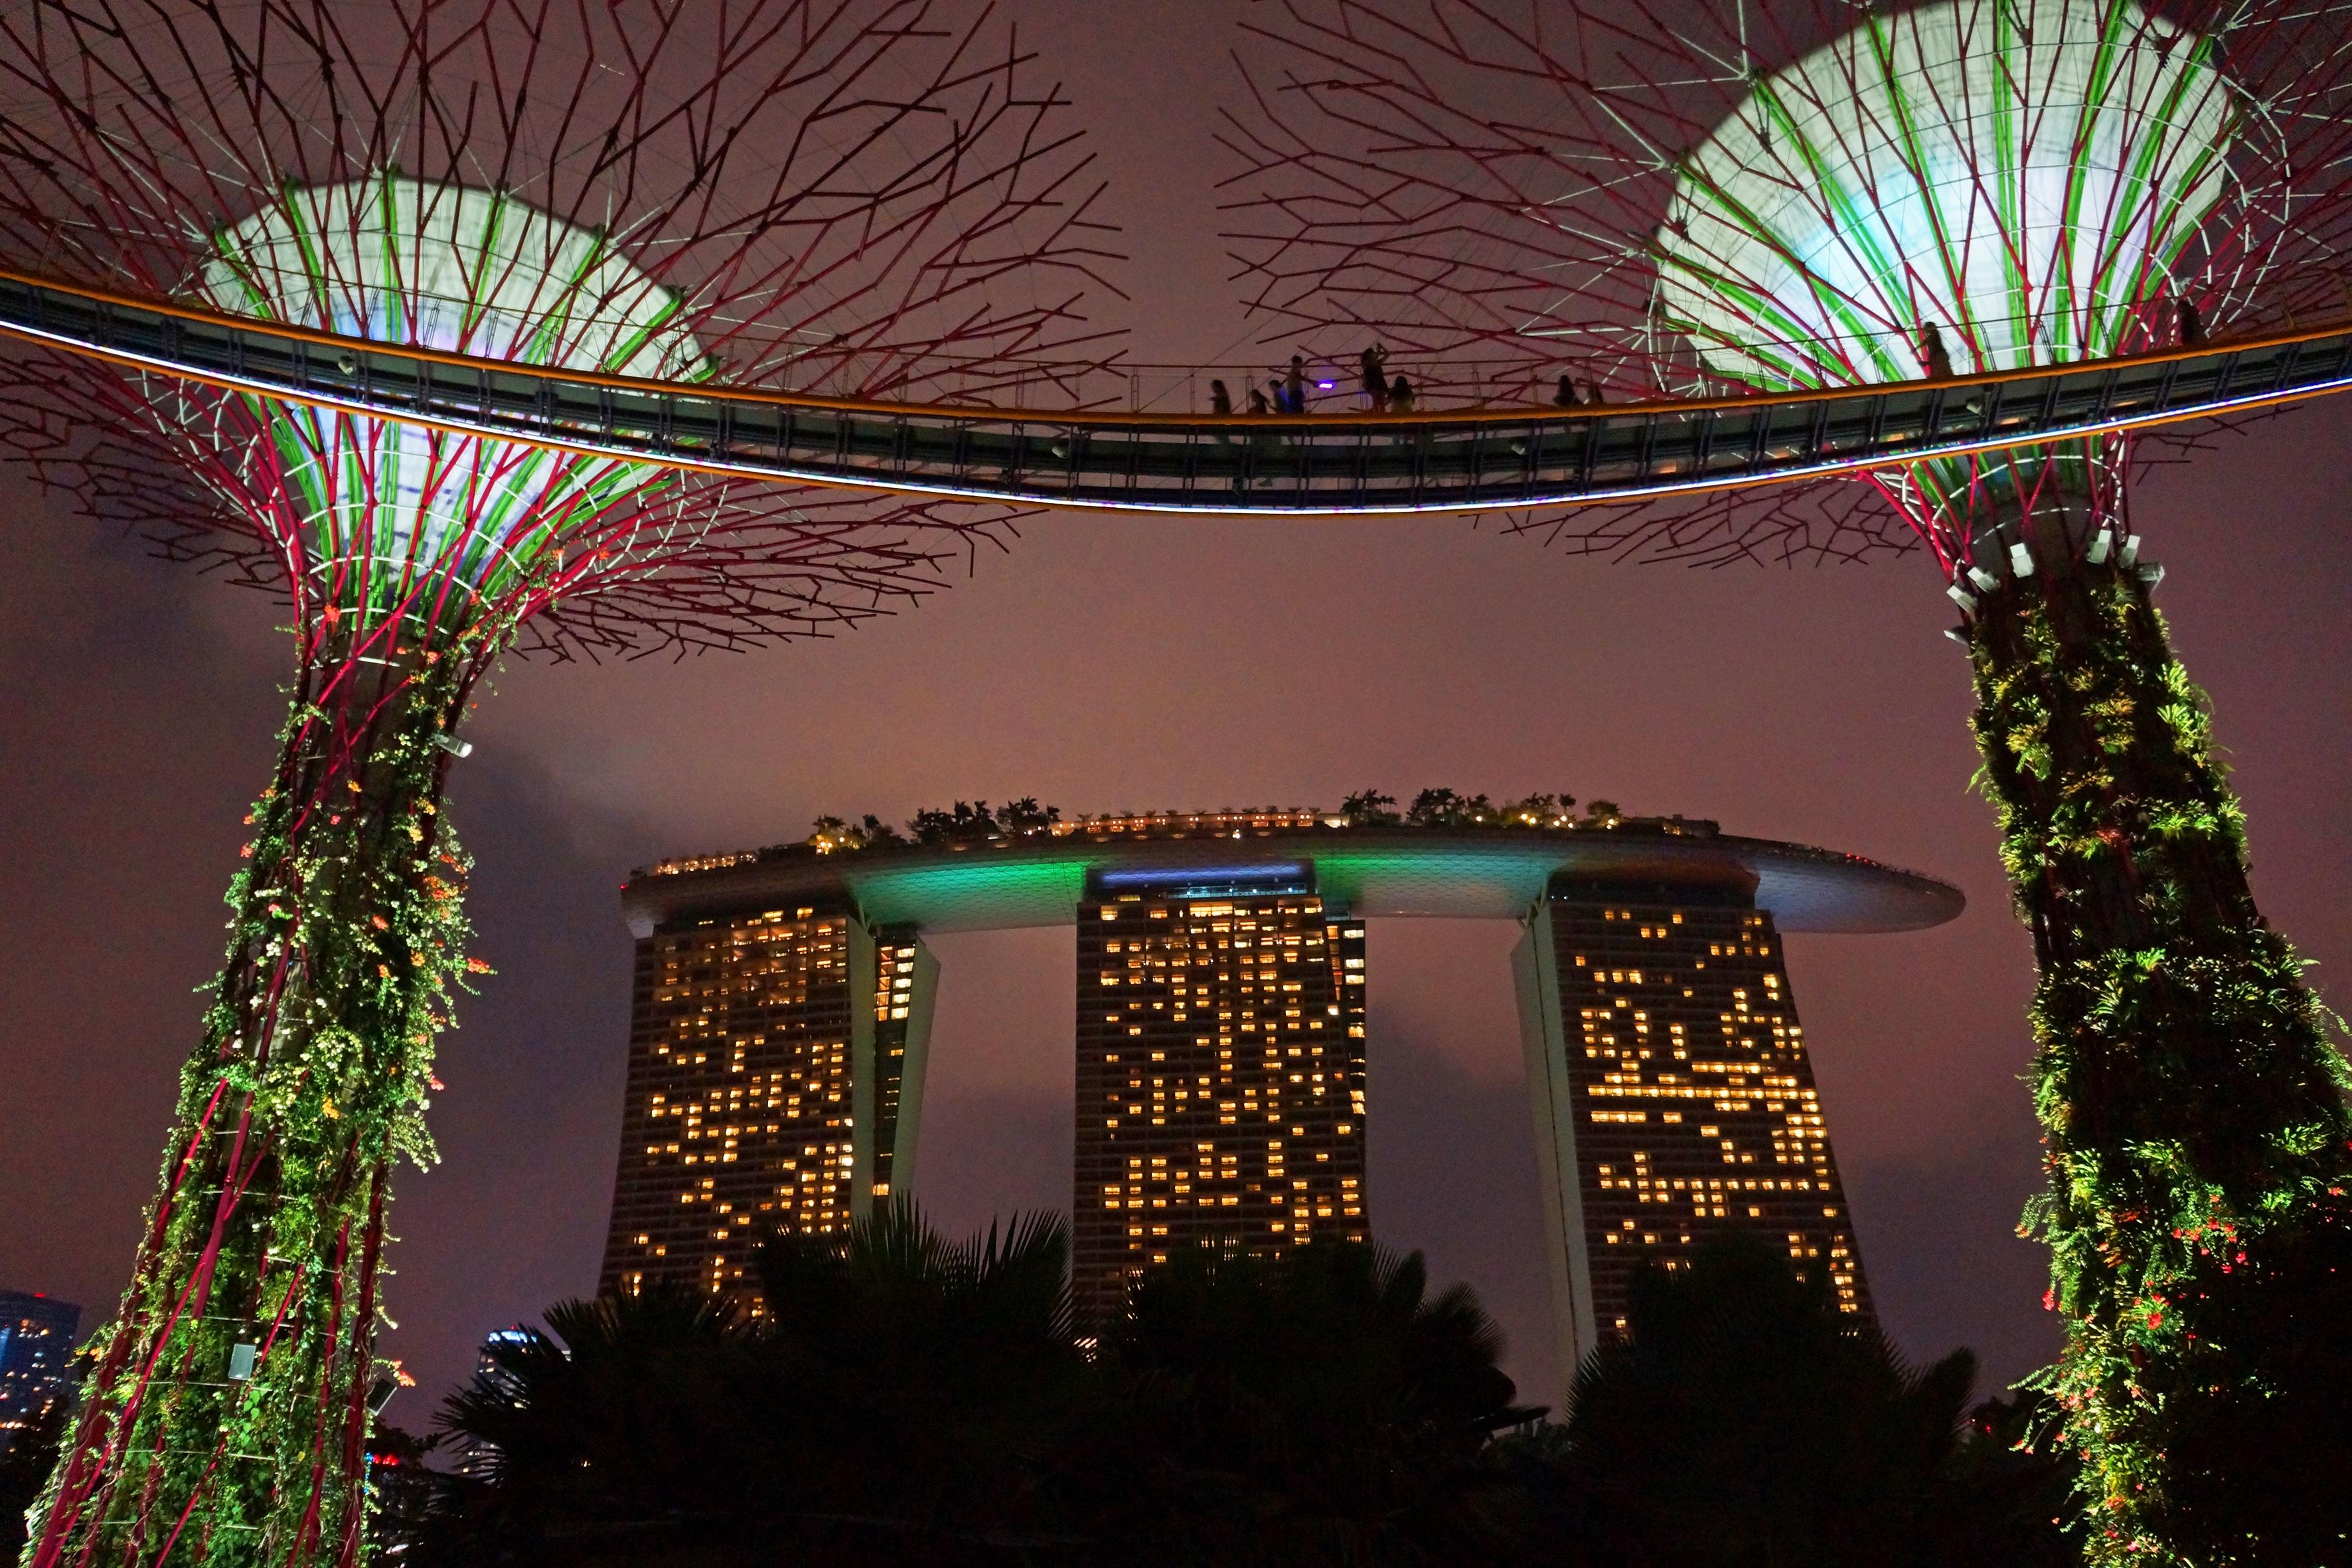 Free Images : light, night, flower, arch, evening, lighting ...